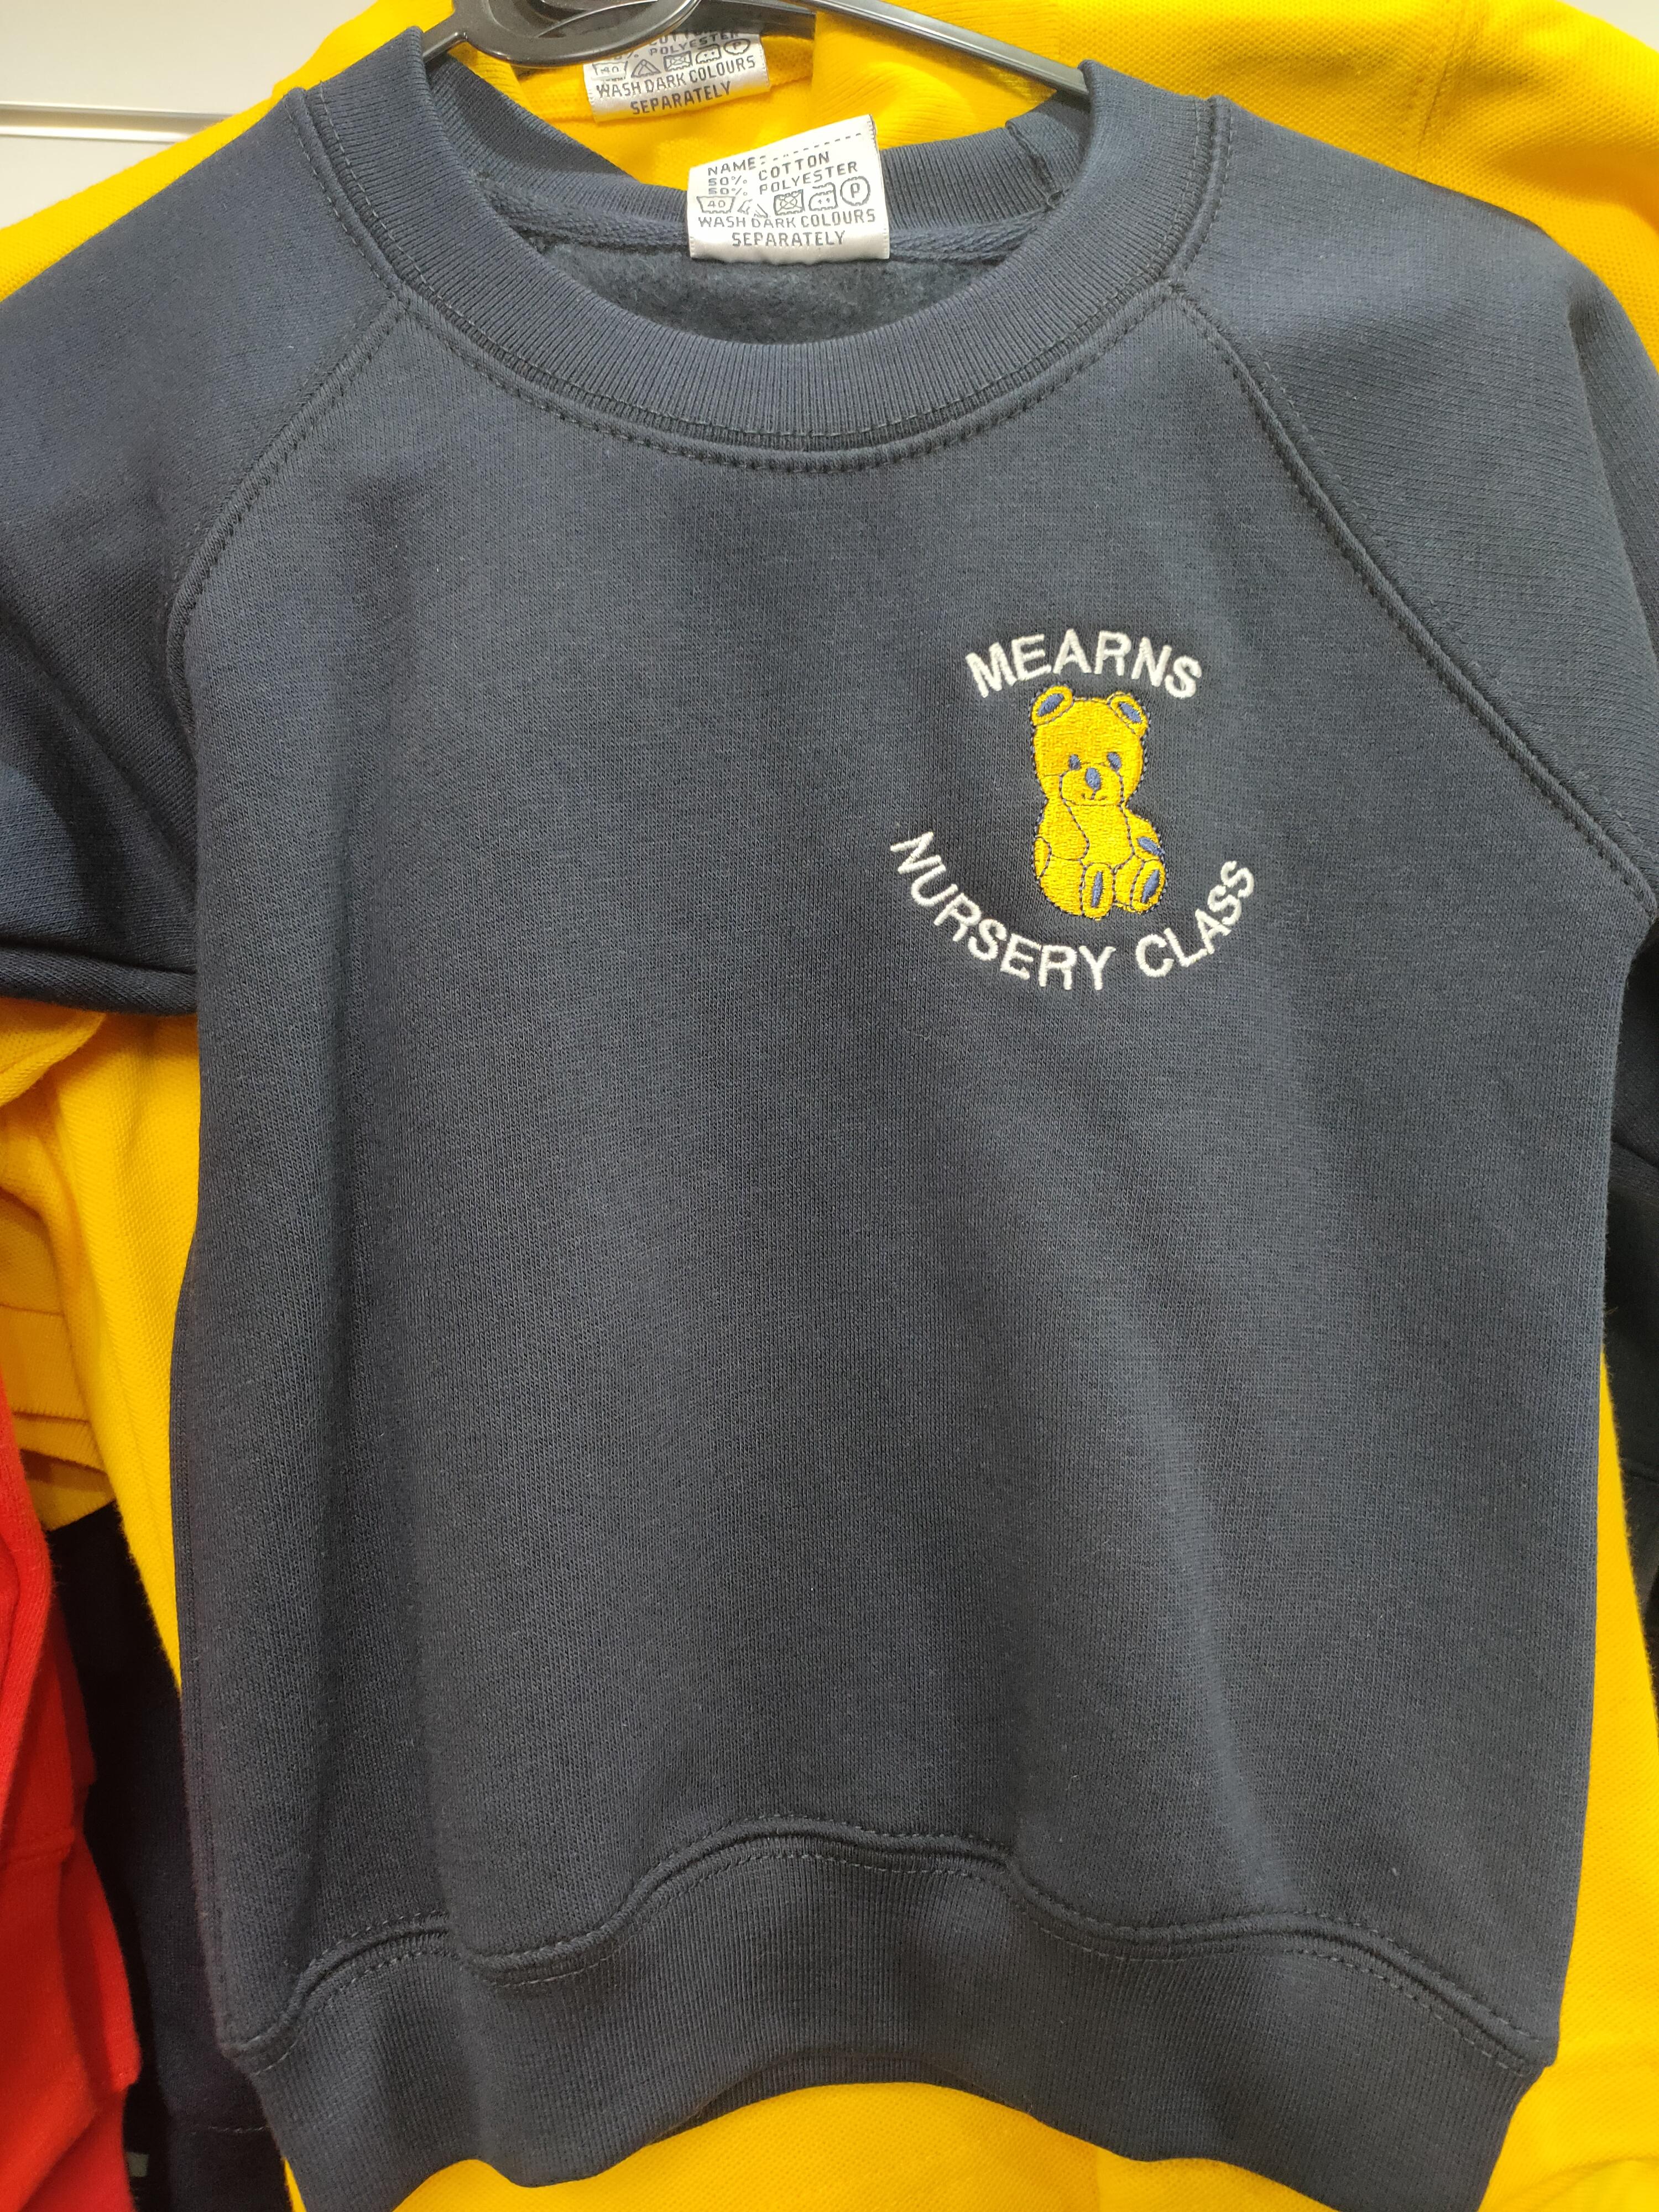 Mearns Nursery Round Neck Sweatshirt